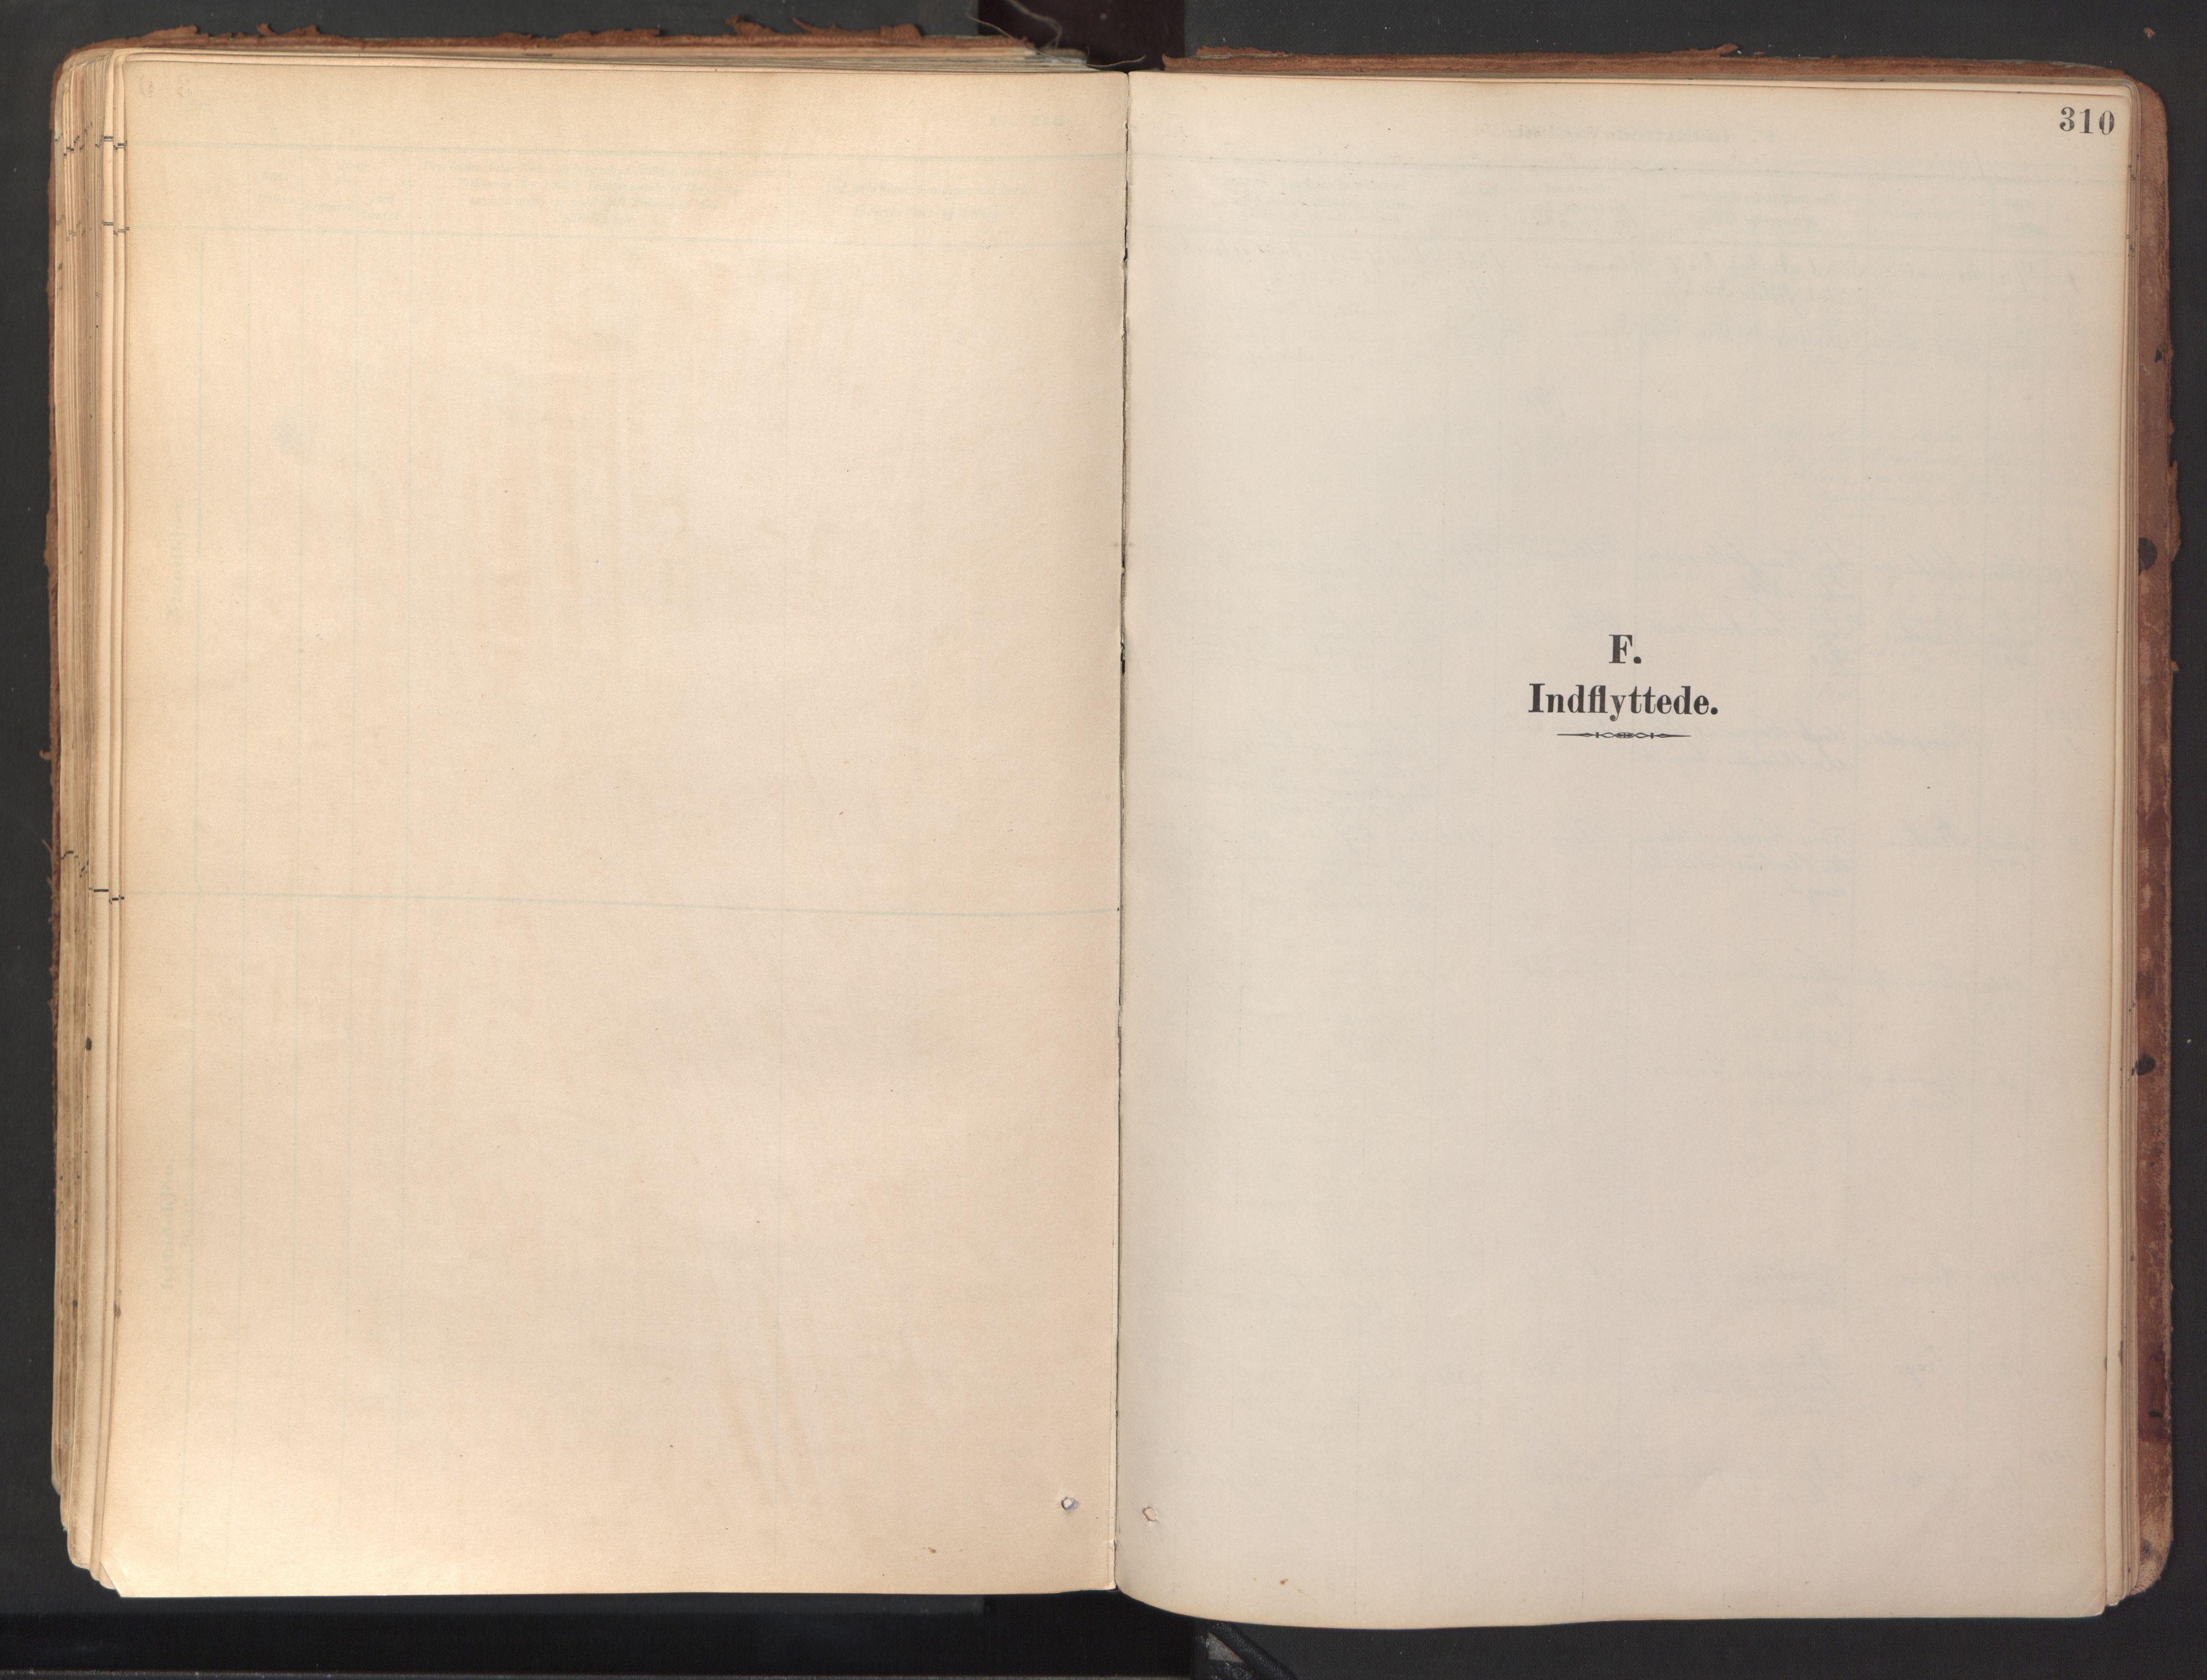 SAT, Ministerialprotokoller, klokkerbøker og fødselsregistre - Sør-Trøndelag, 689/L1041: Parish register (official) no. 689A06, 1891-1923, p. 310